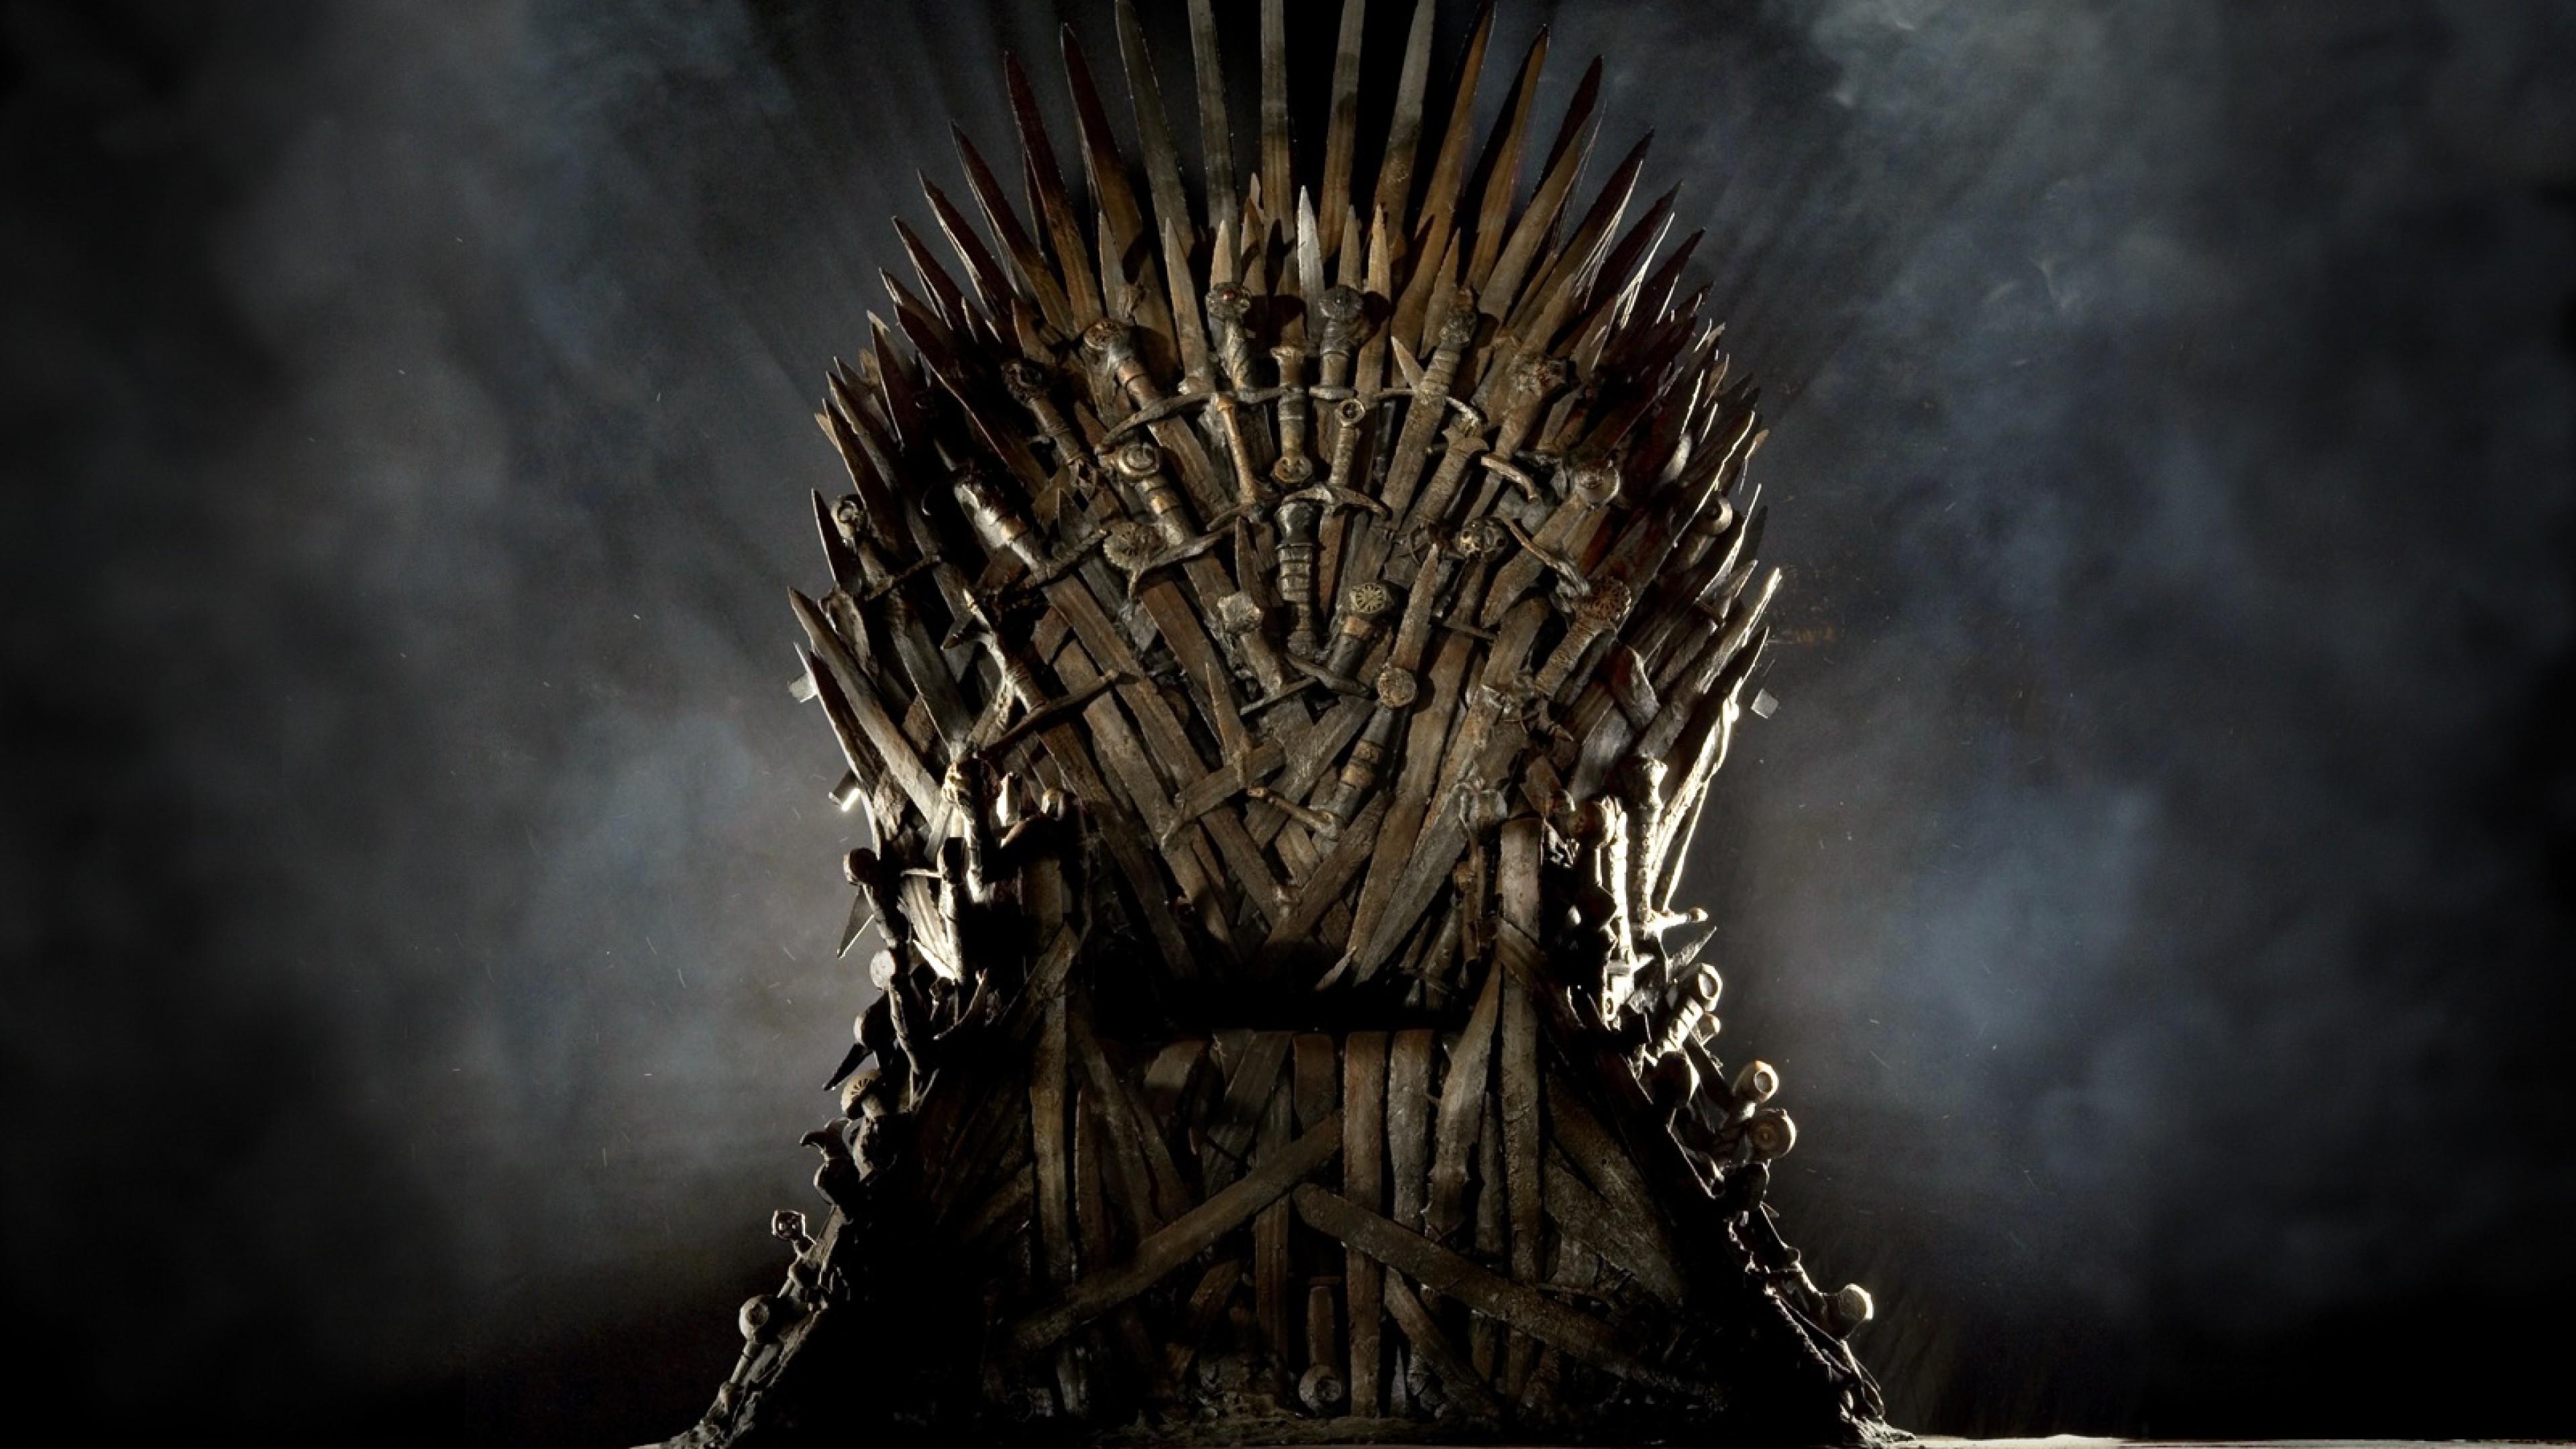 Game of thrones, Series, Throne, Power, Sword Wallpaper,